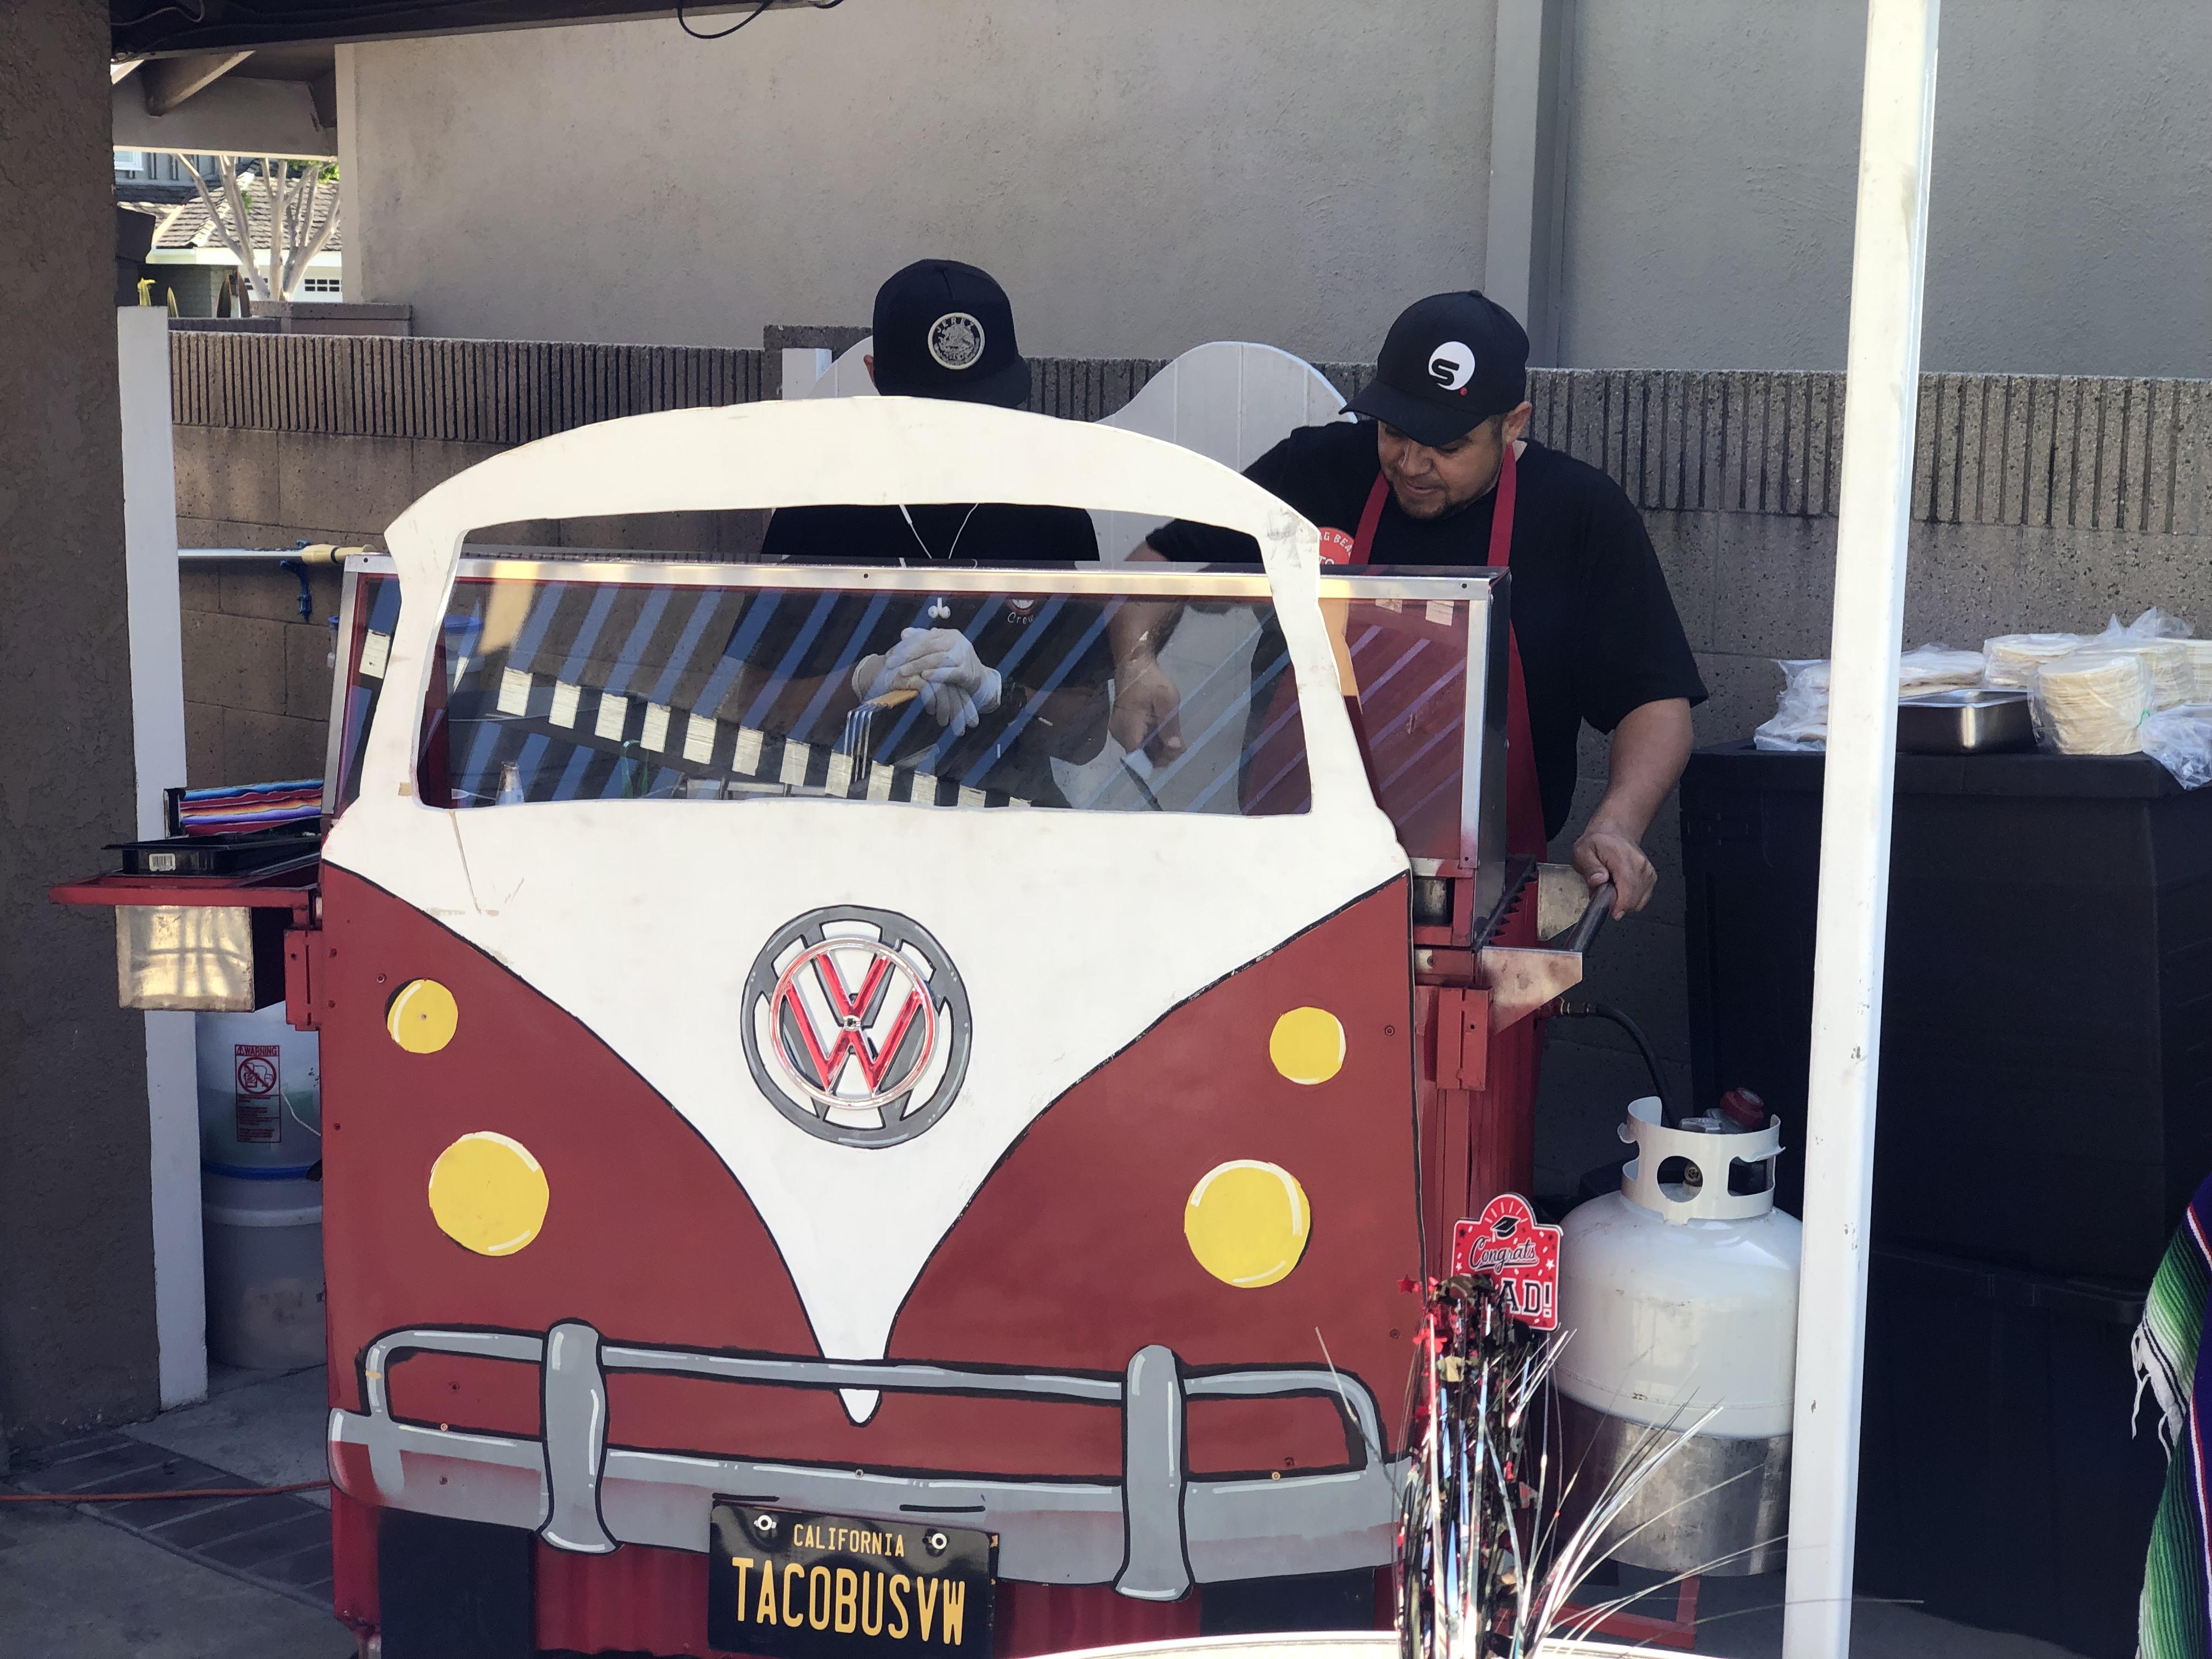 taco bus VW